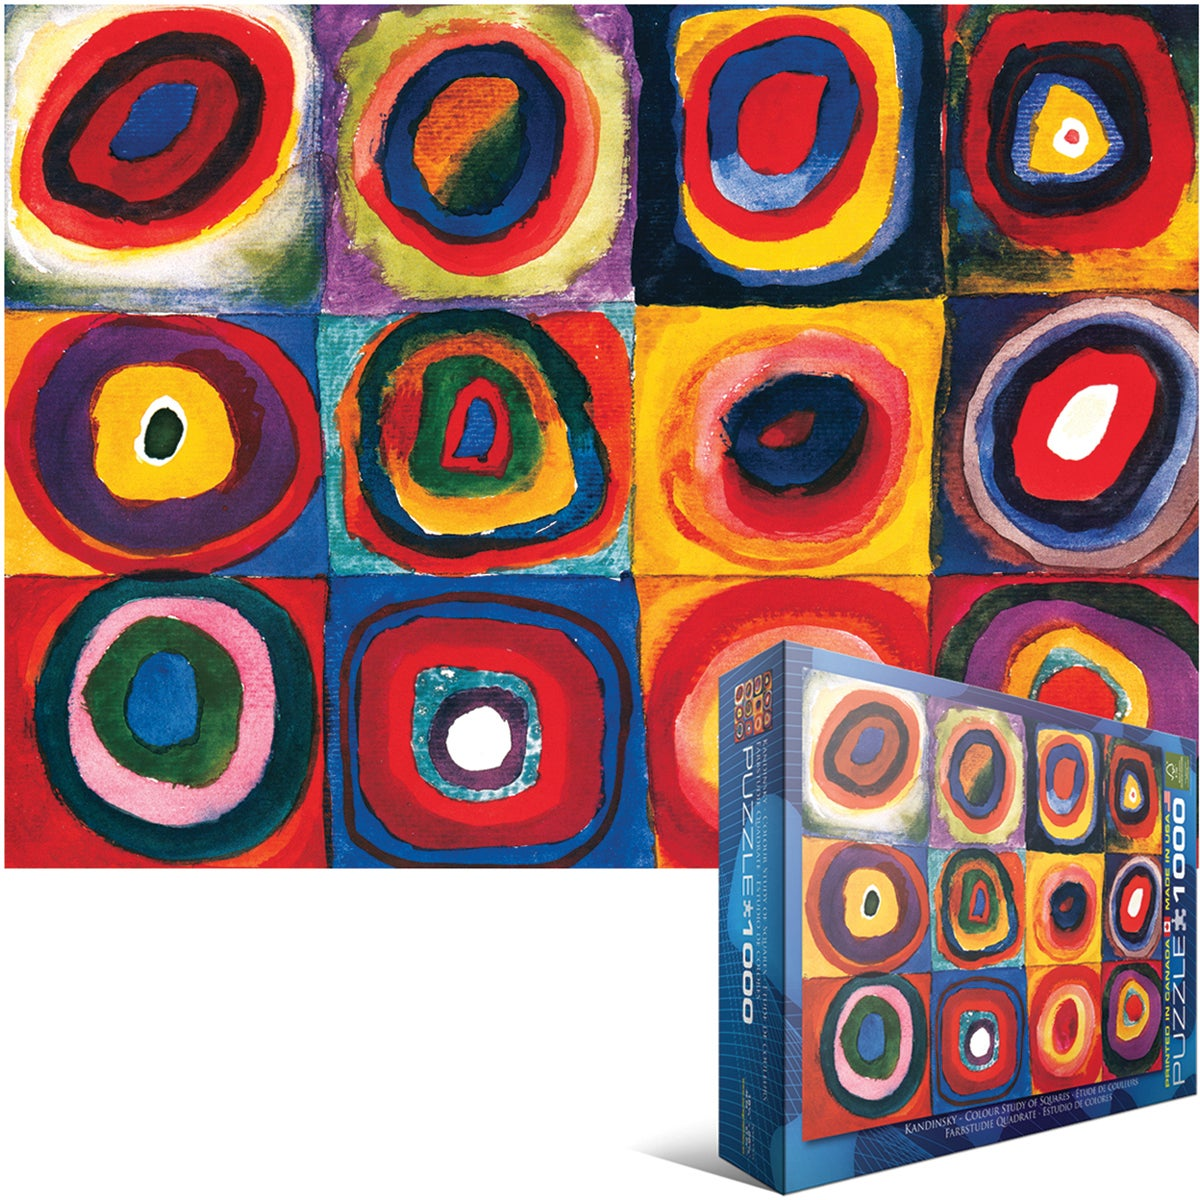 Jigsaw Puzzle 1000 Pieces -Kandinsky - Study Squares